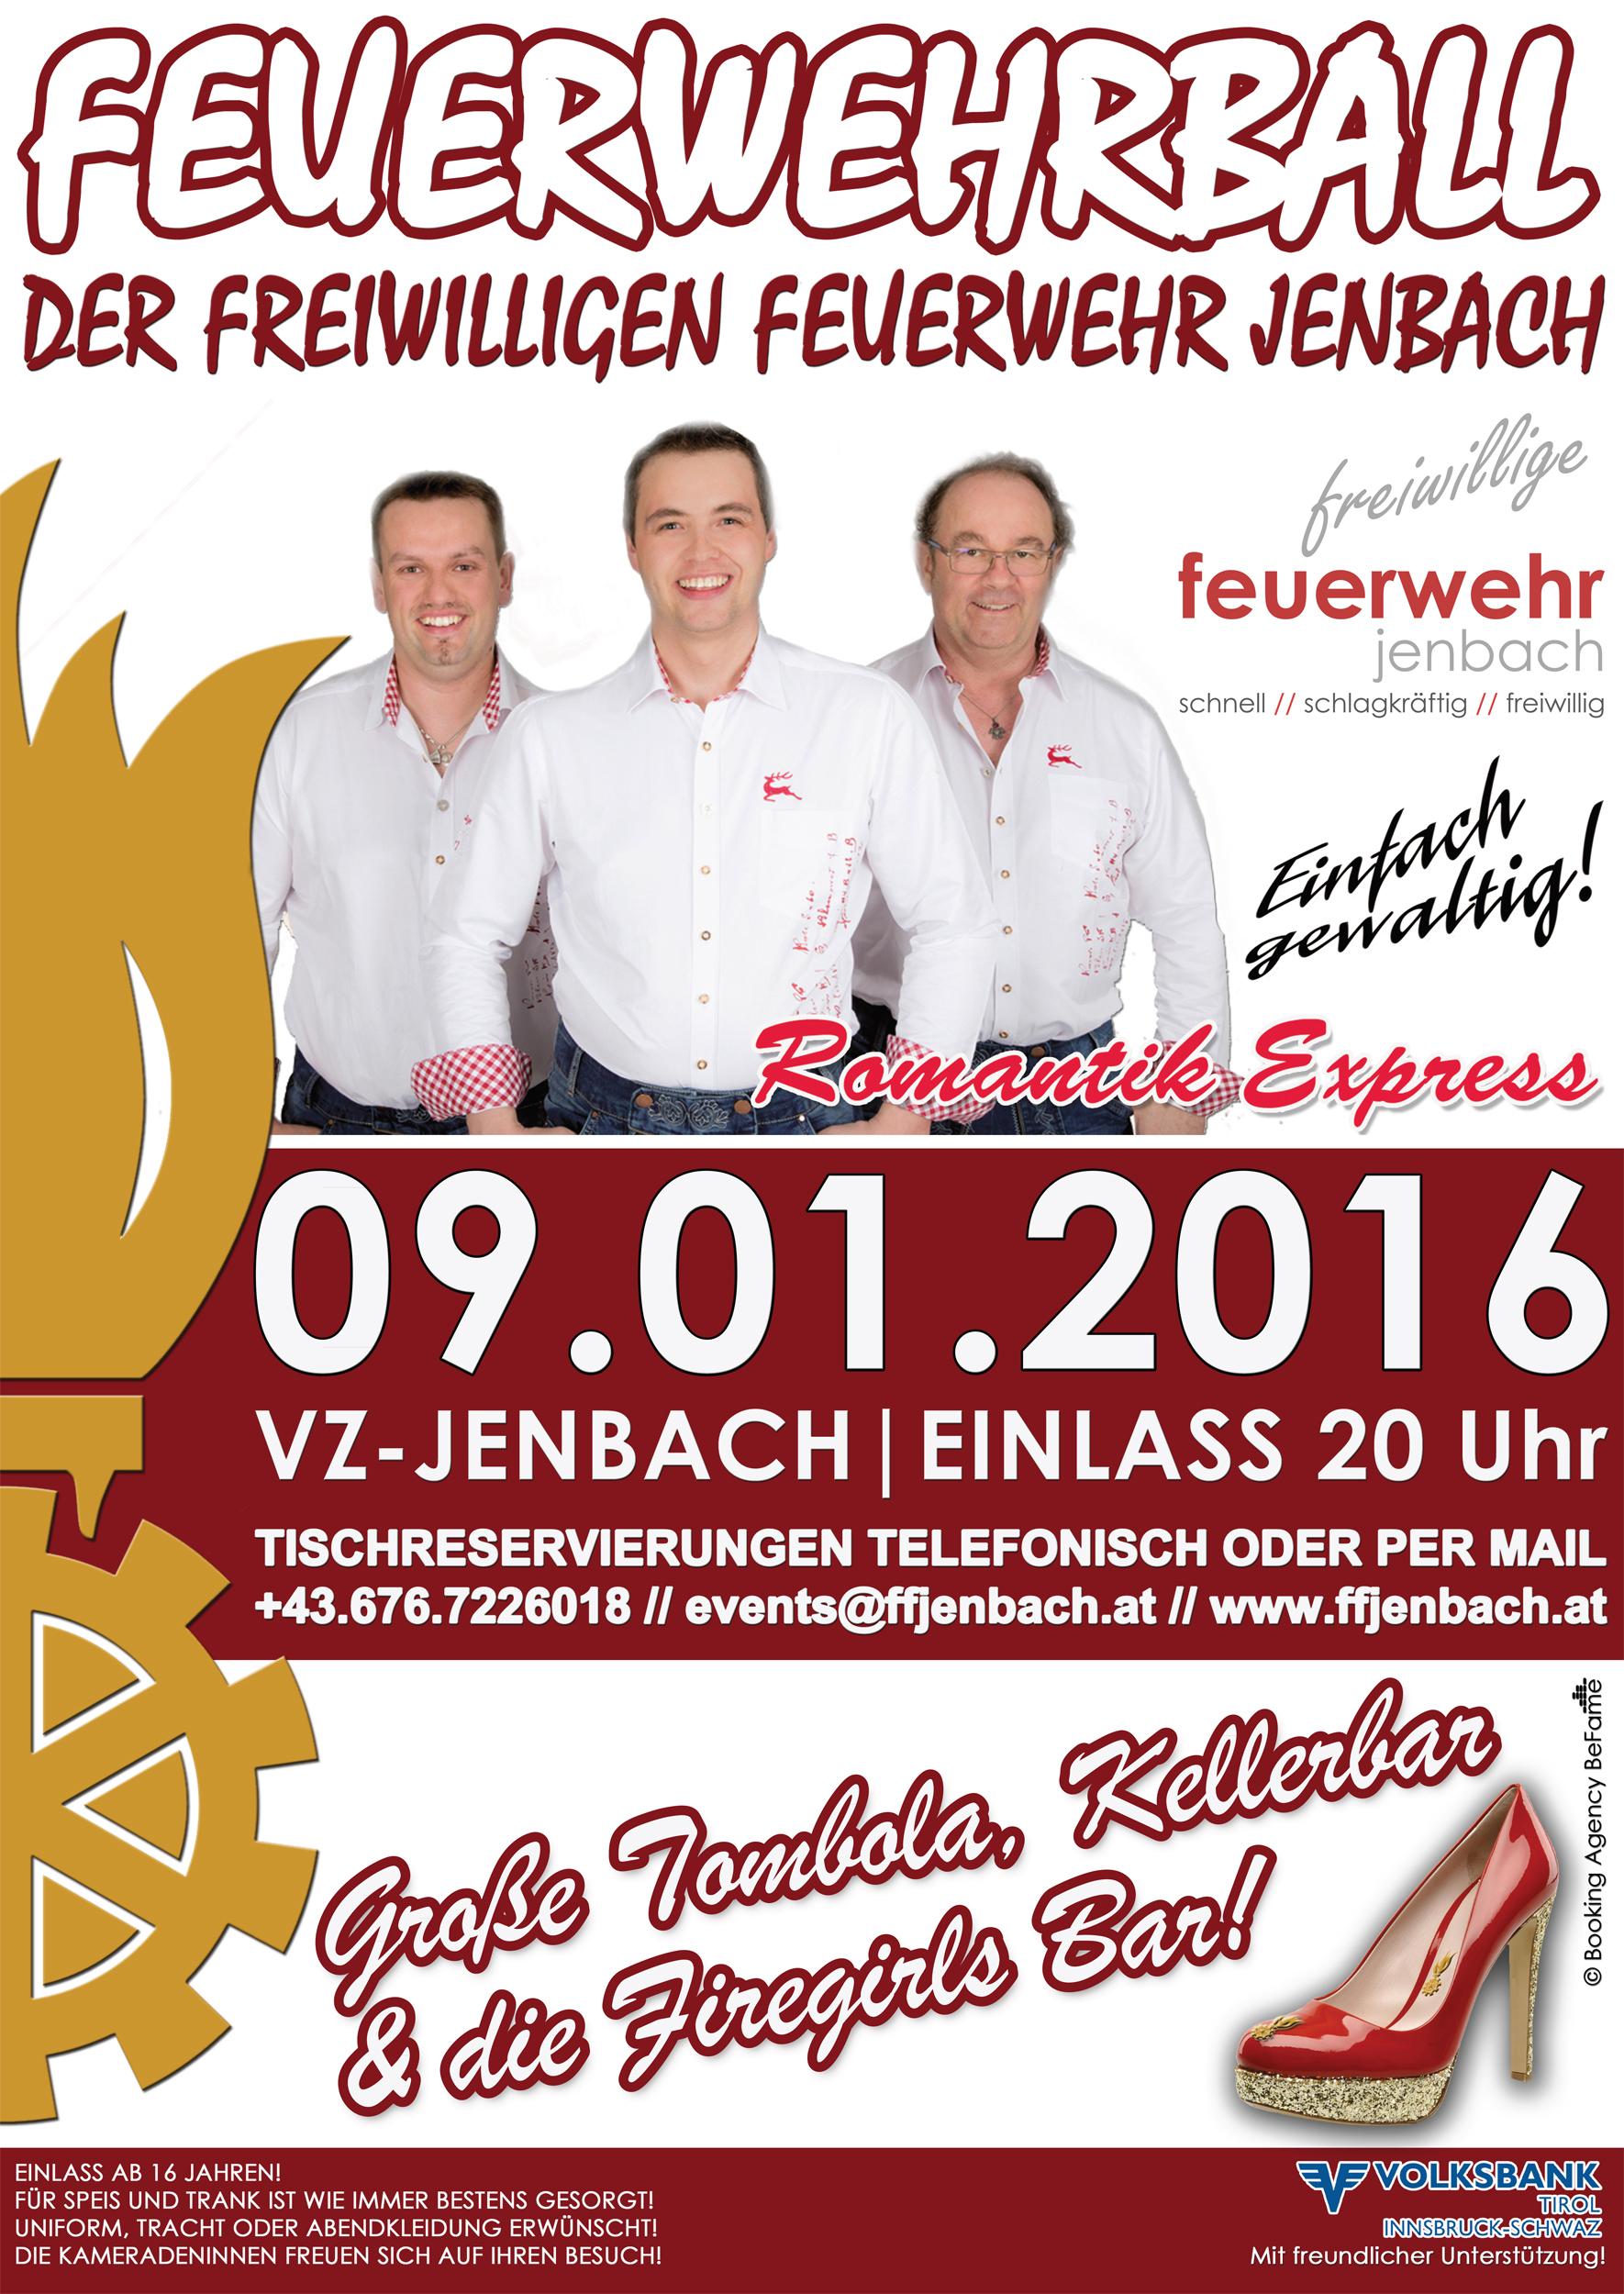 09.01.2016 // Feuerwehrball Jenbach